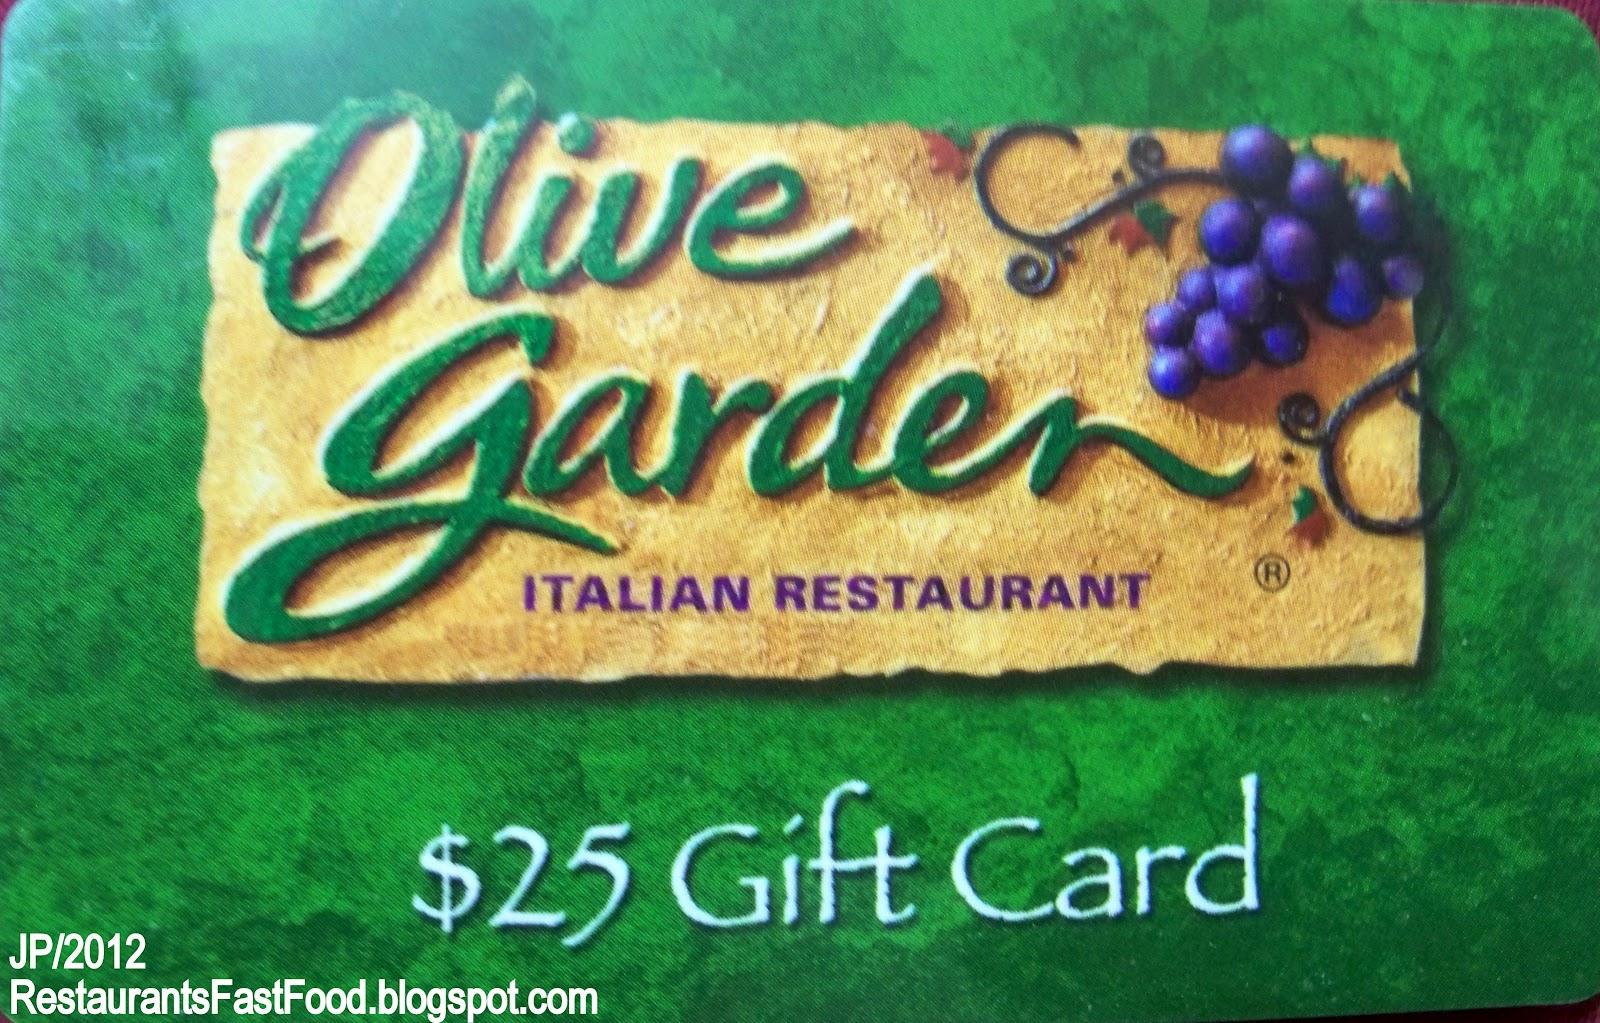 olive garden restaurant jacksonville florida phillips hwy olive garden italian restaurant jacksonville fl jax - Olive Garden Jacksonville Fl